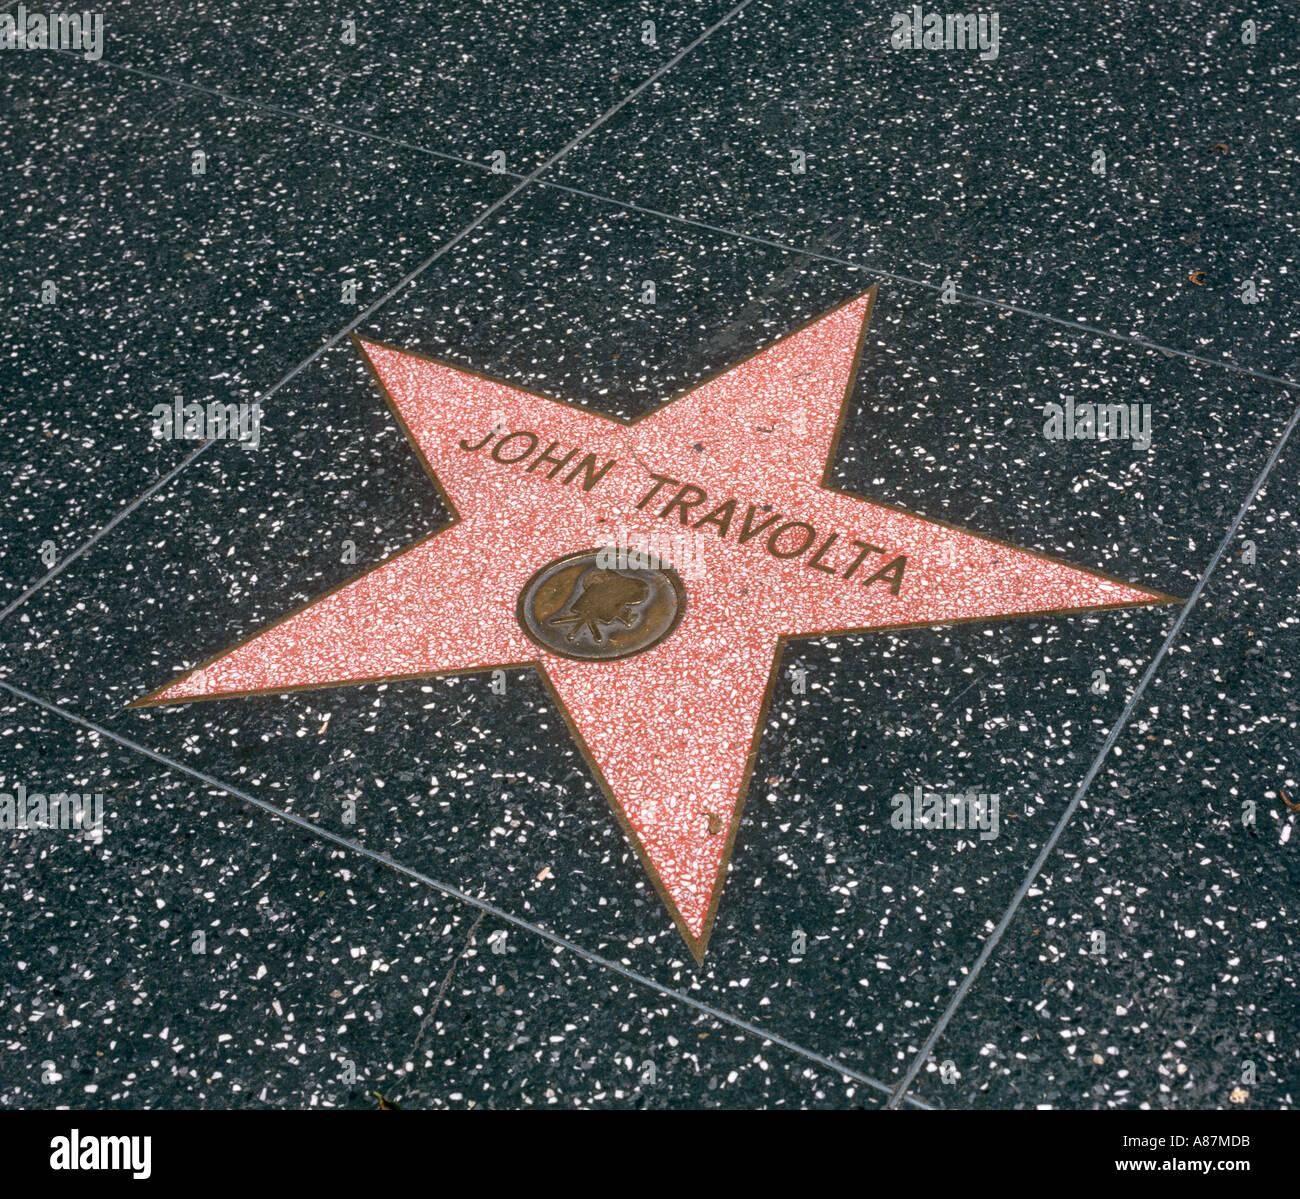 John Travolta stella sulla Hollywood Walk of Fame, Los Angeles, California, Stati Uniti d'America Immagini Stock